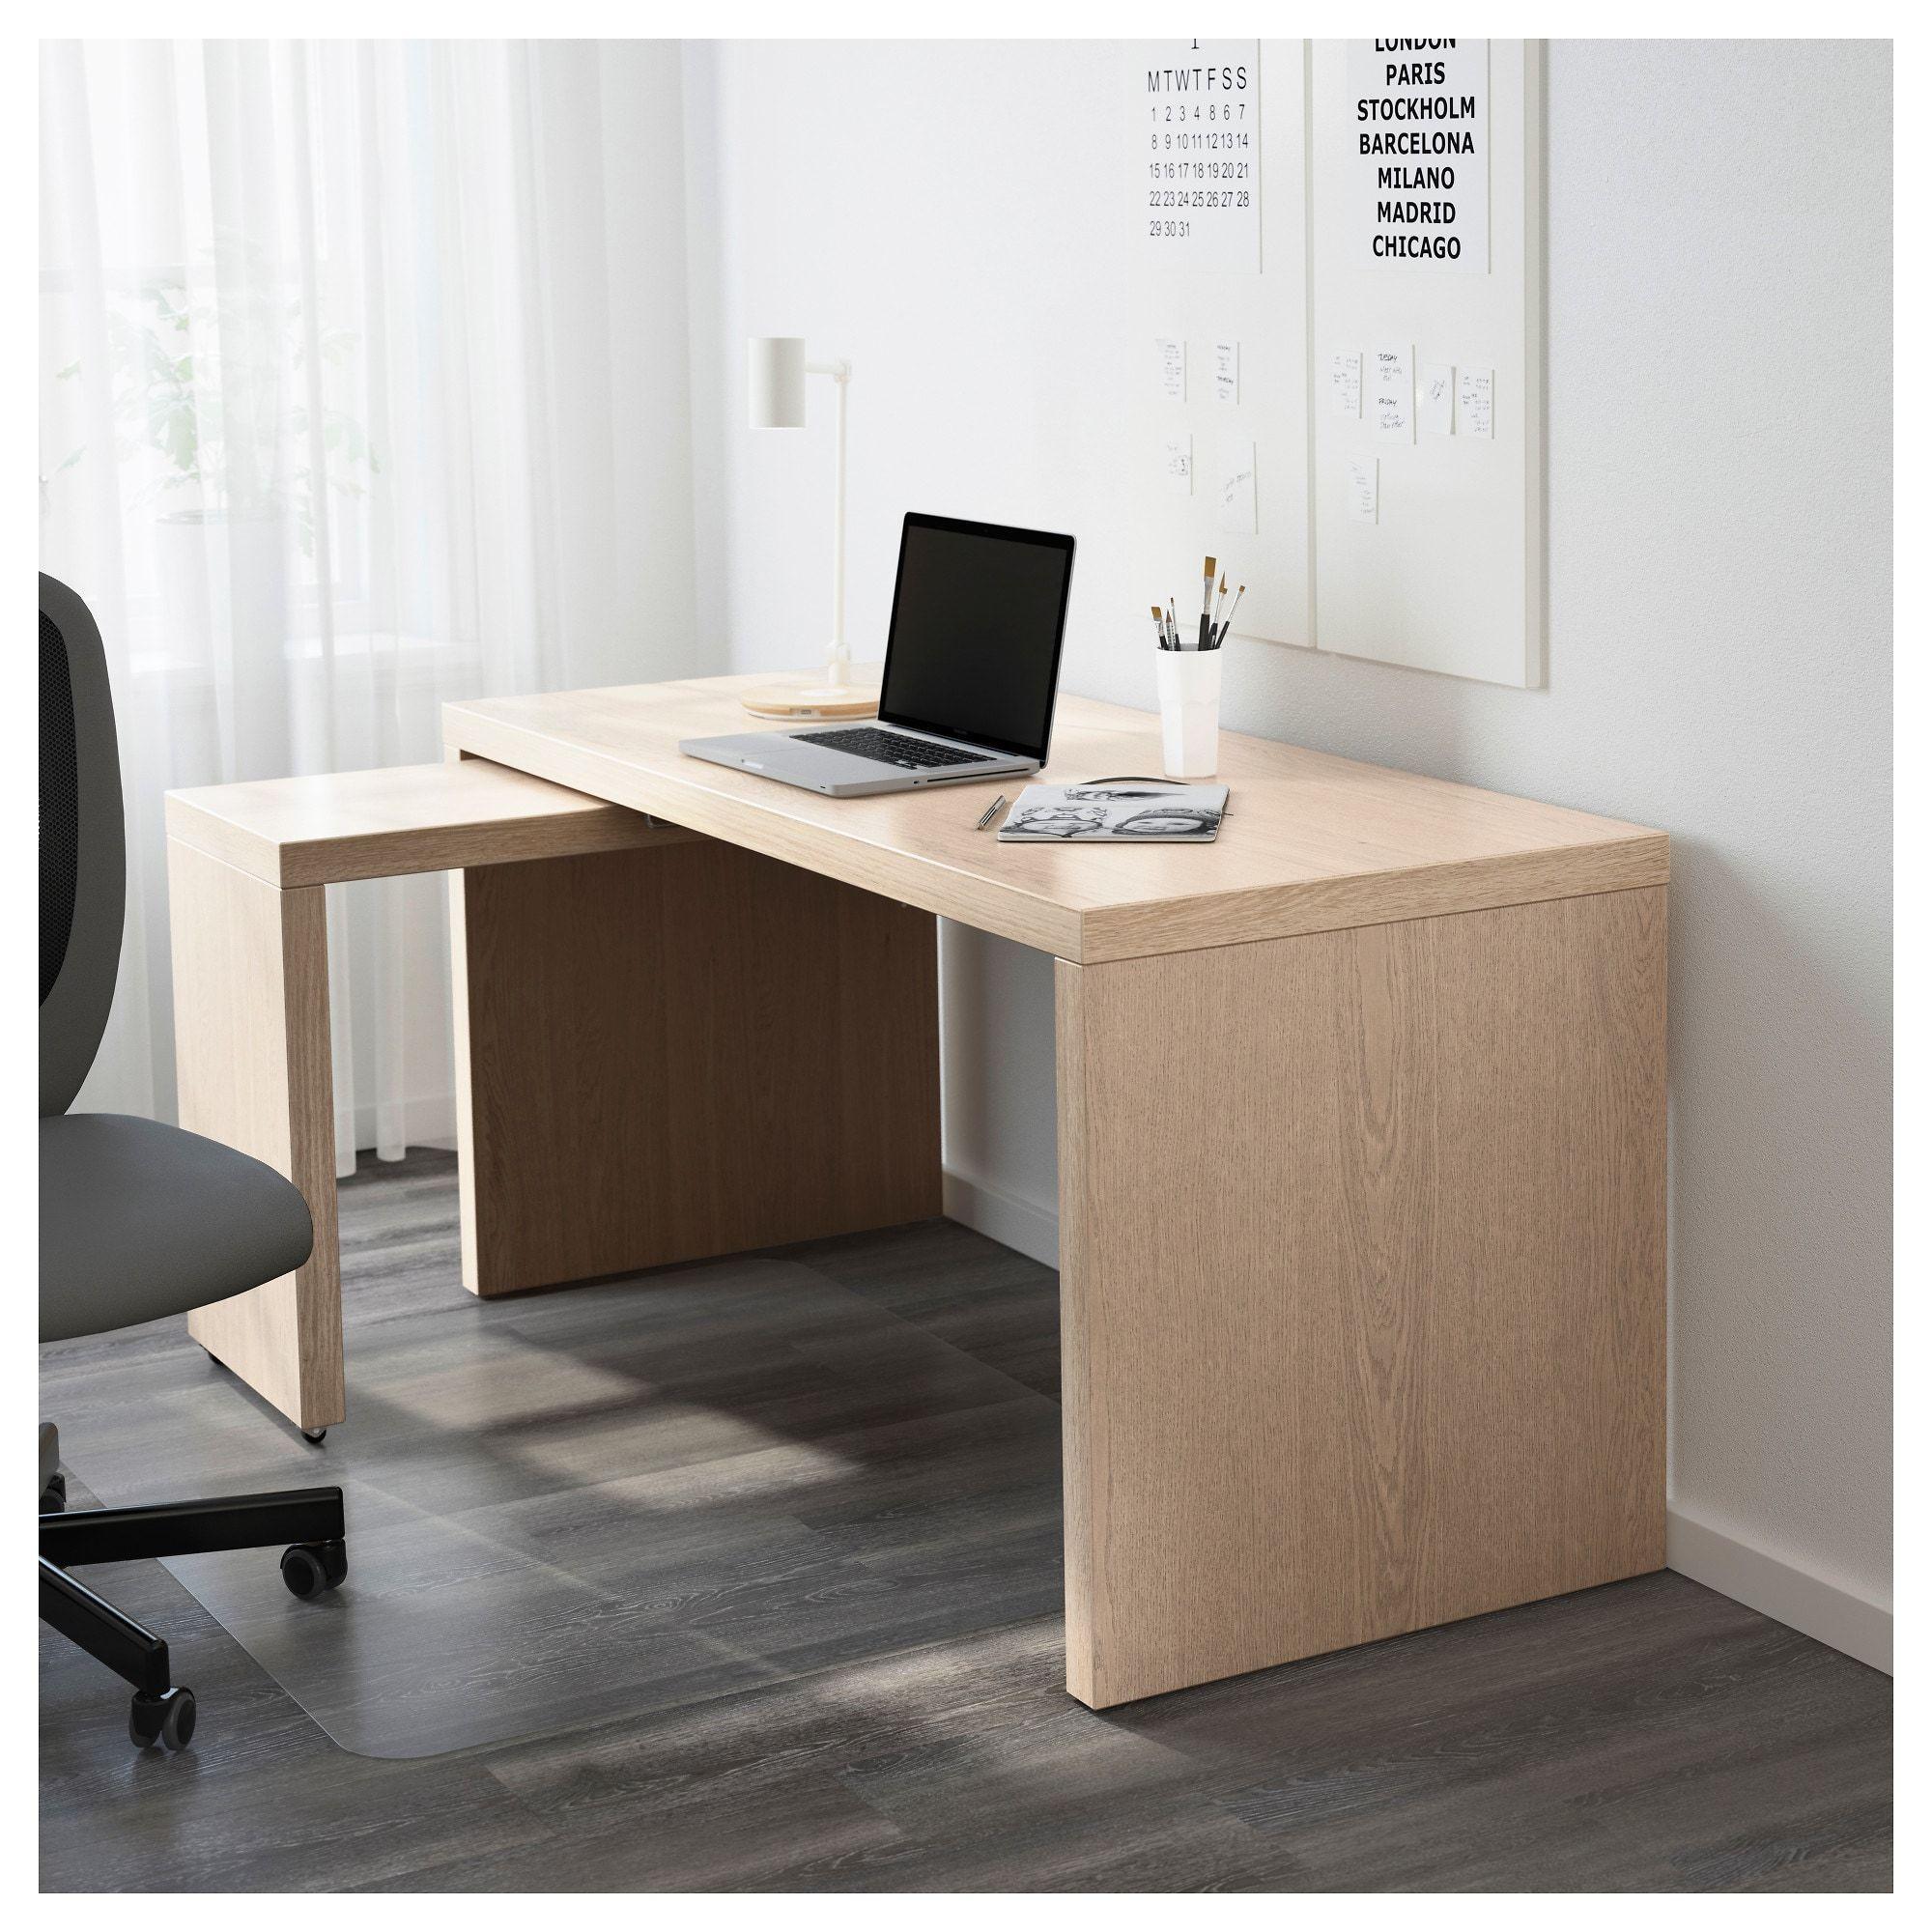 Ikea Schreibtisch Malm 2021